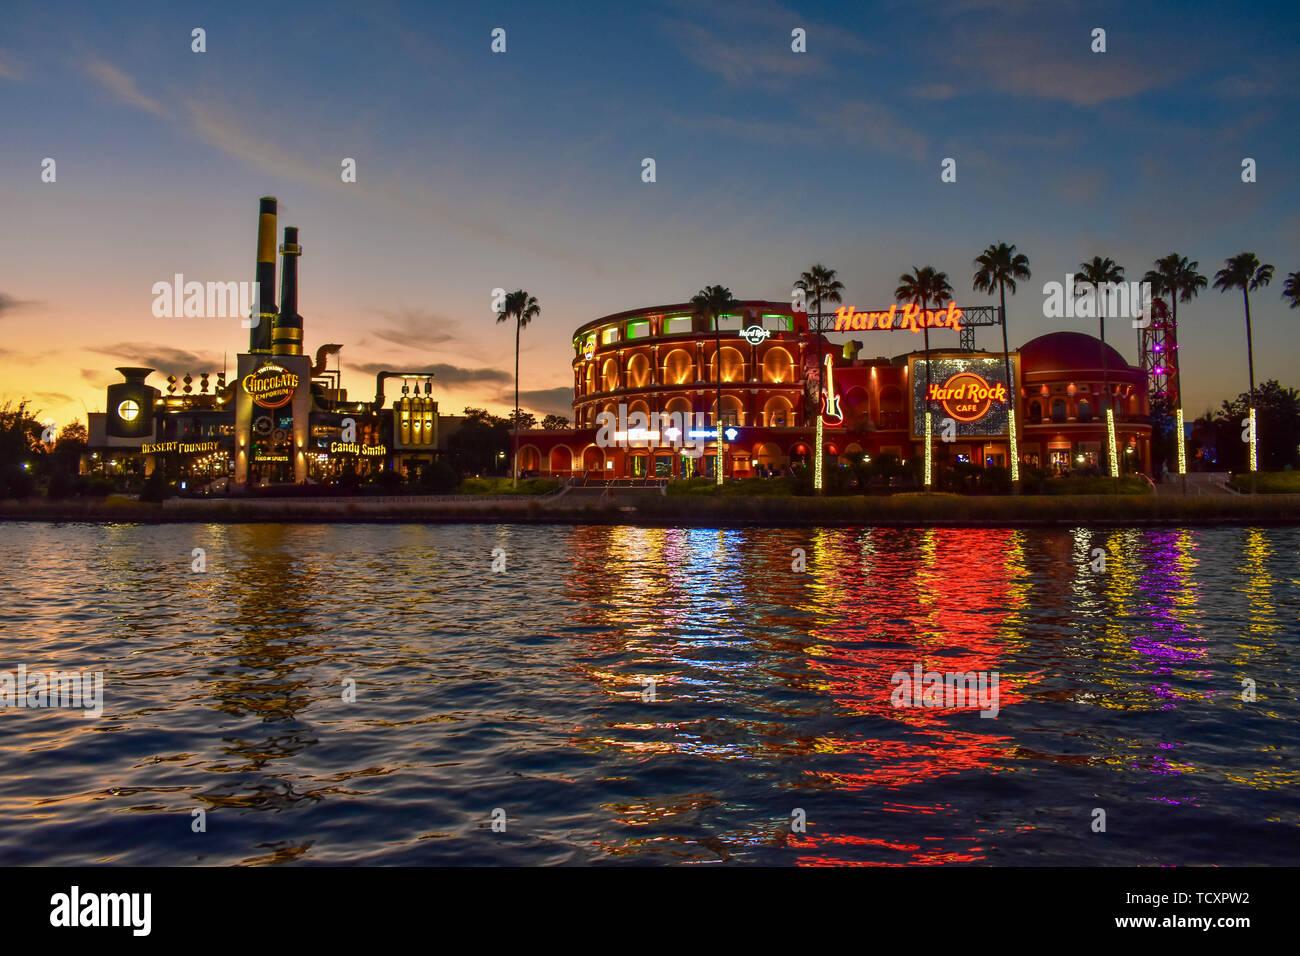 Orlando, Florida. February 05, 2019.  Chocolate Emporium Restaurant and Hard Rock Cafe on colorful sunset background at Universal Studios area. - Stock Image